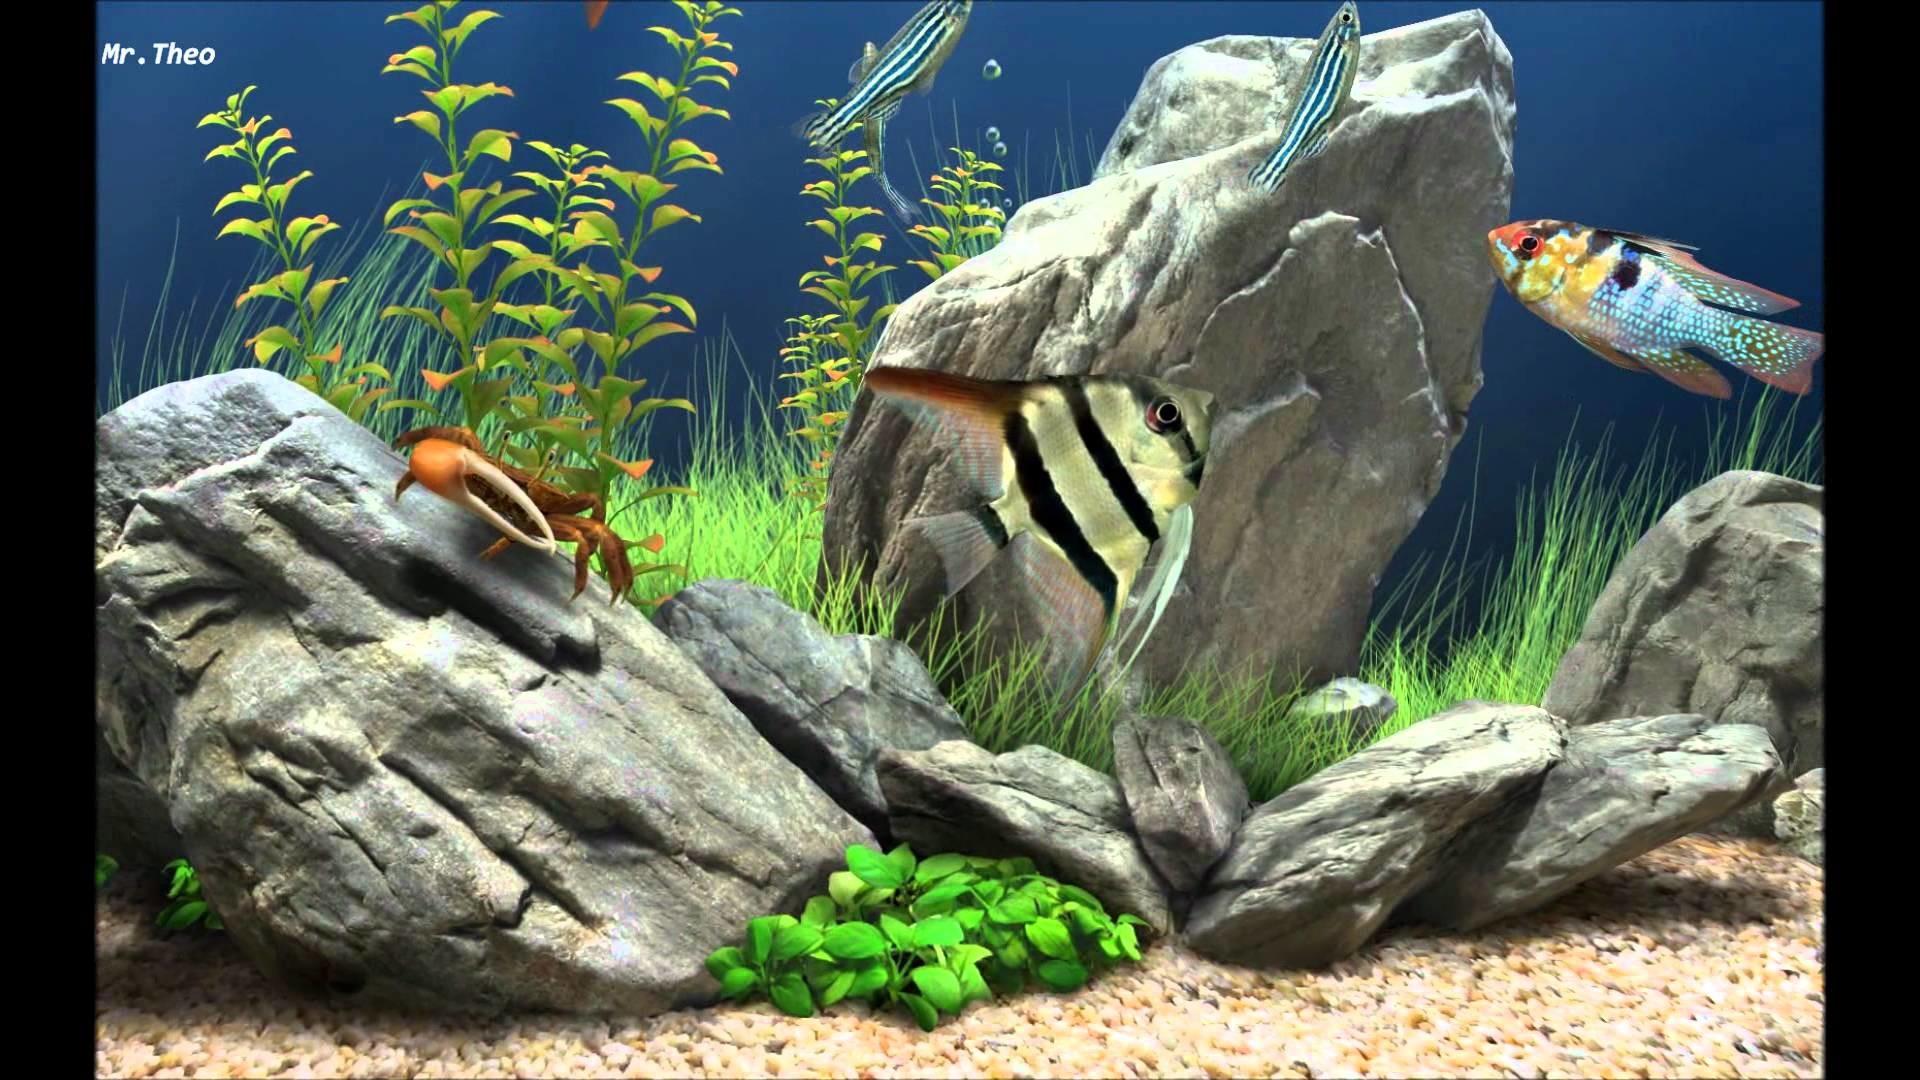 Full Size of Fish Tank Fish Tank Screensaver Windows Marine Aquarium Live  Free Downloadfish Mac Screensavers …